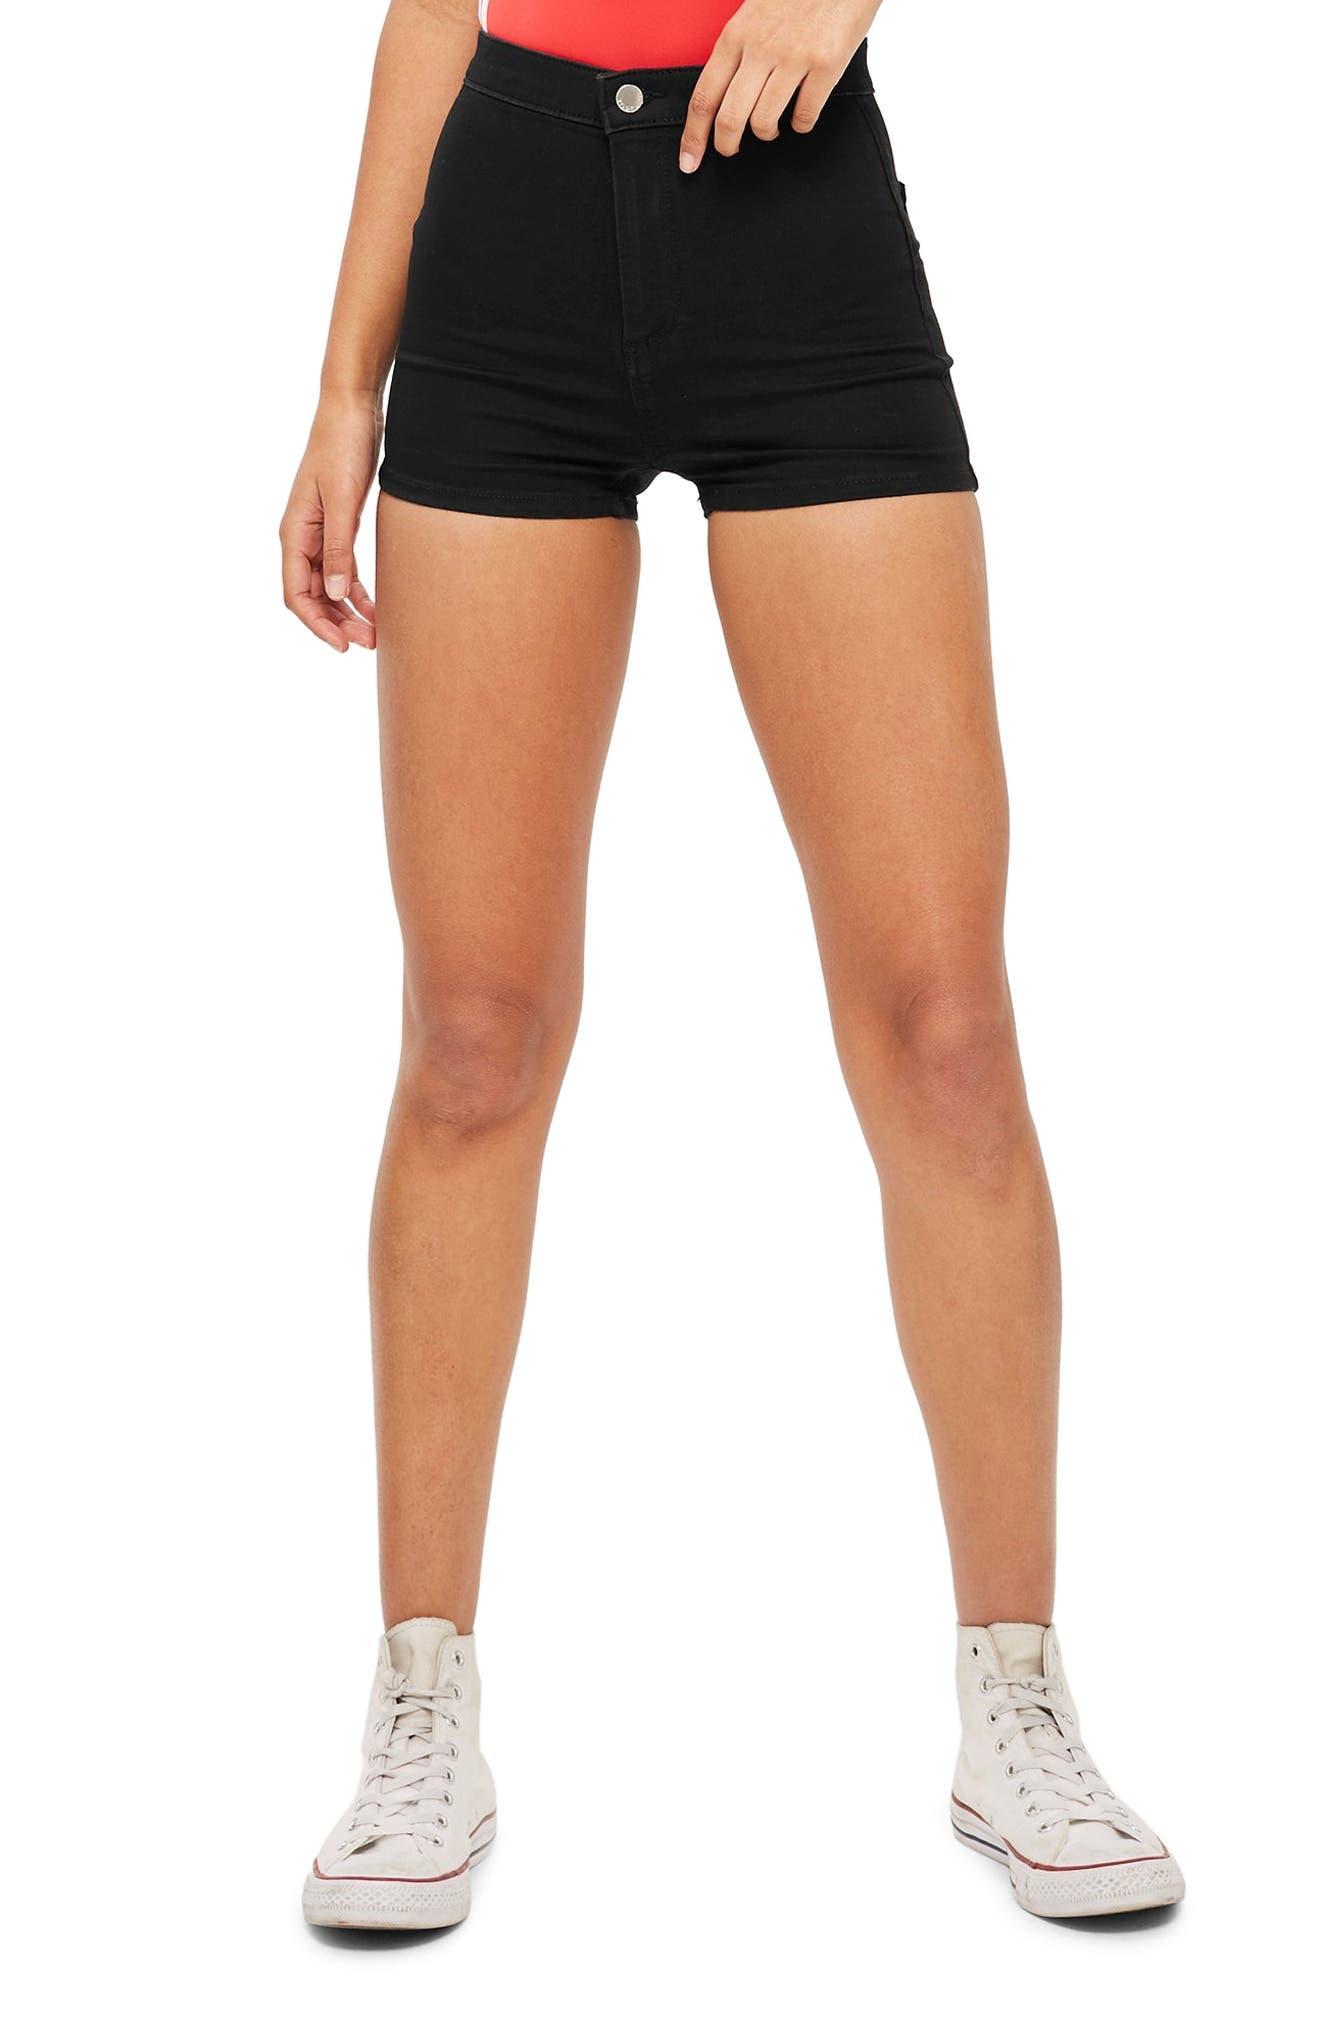 TOPSHOP, Joni High Waist Denim Shorts, Alternate thumbnail 3, color, BLACK